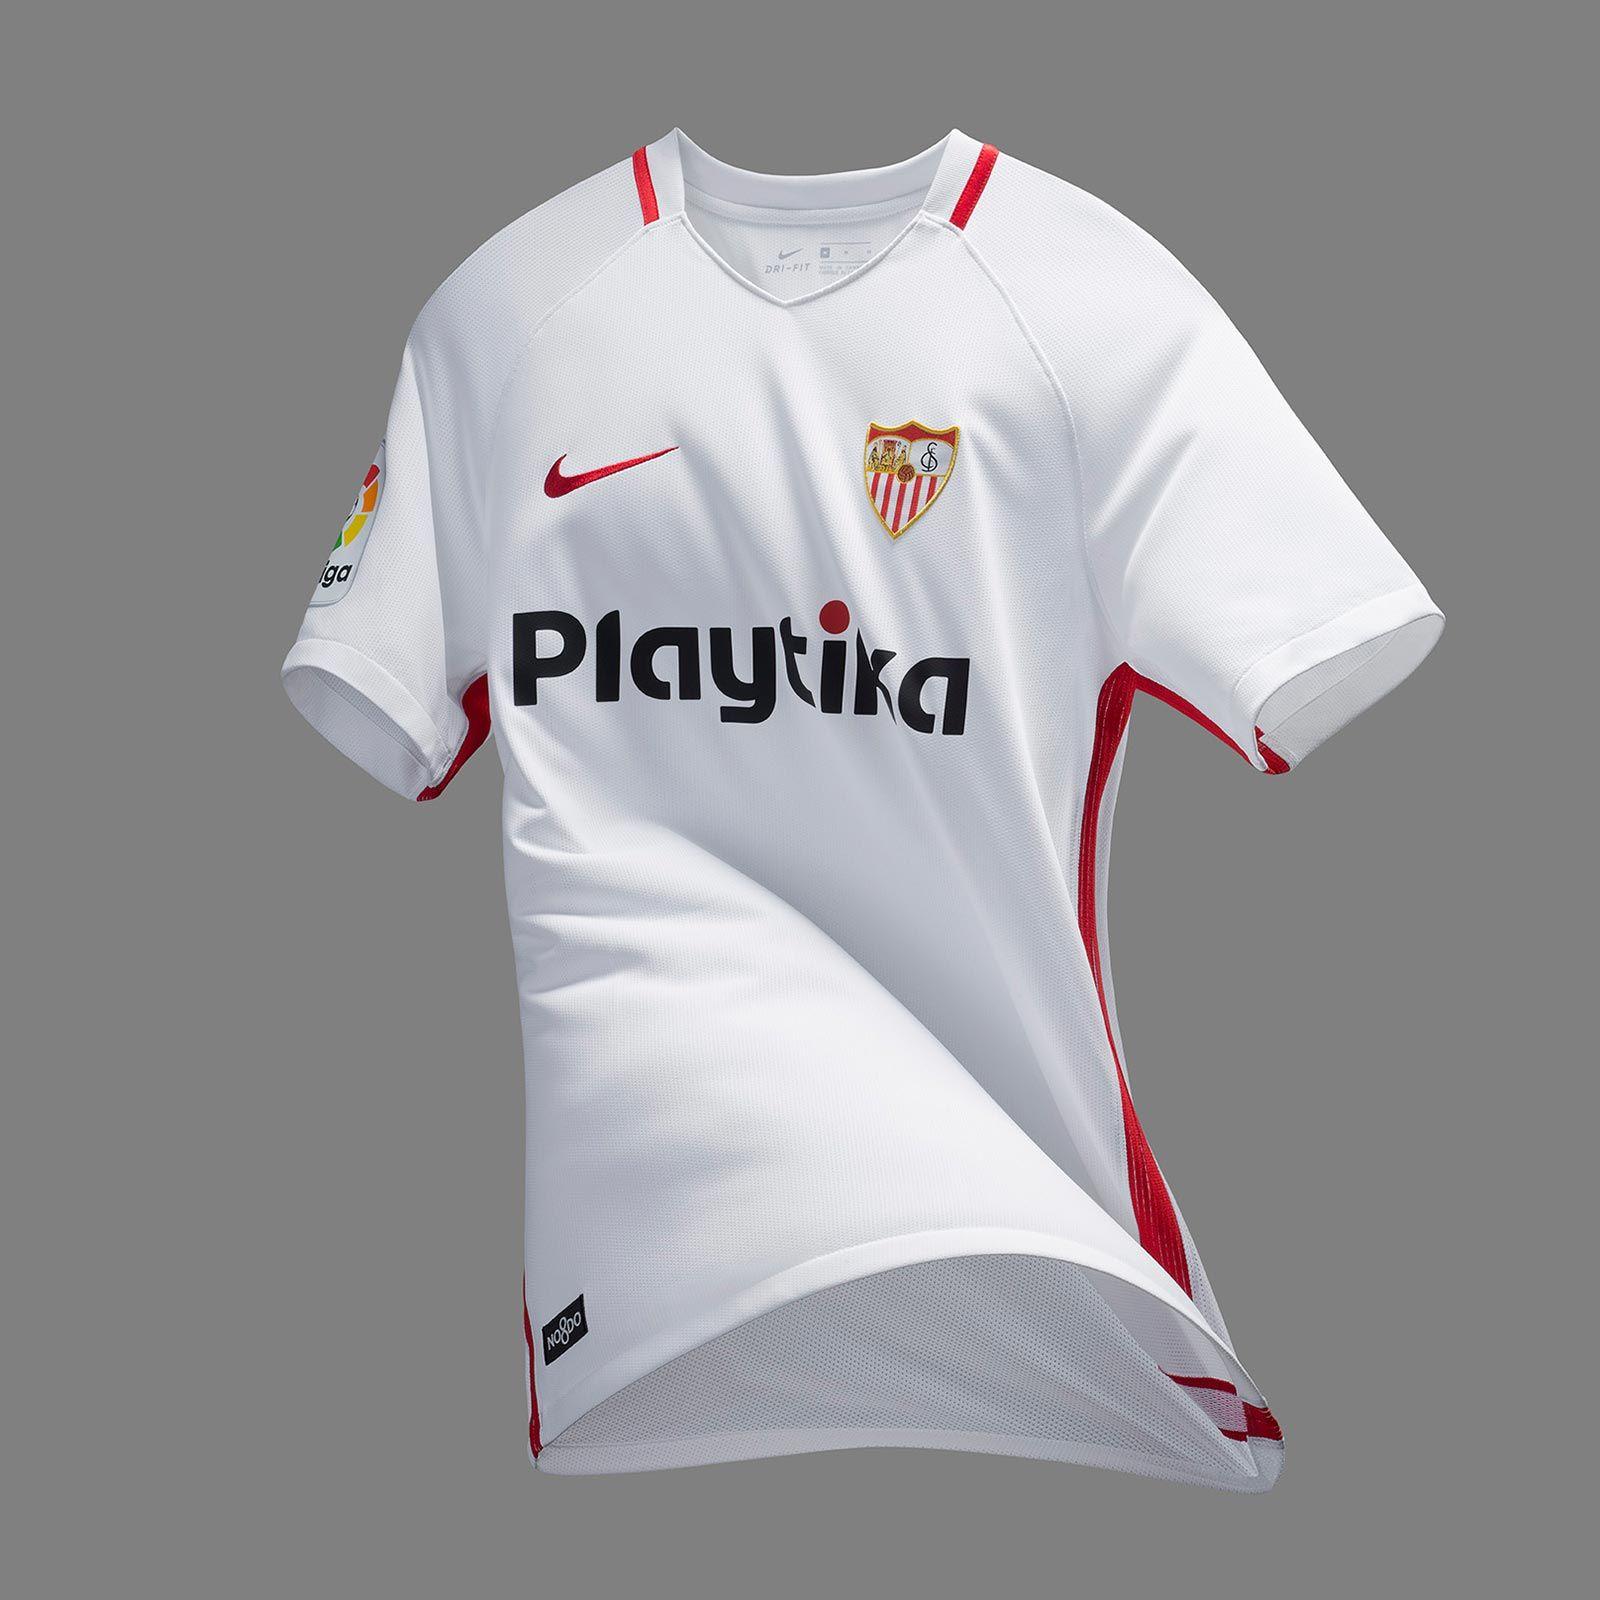 Pin De The King Em Futurmaglie Camisa De Futebol